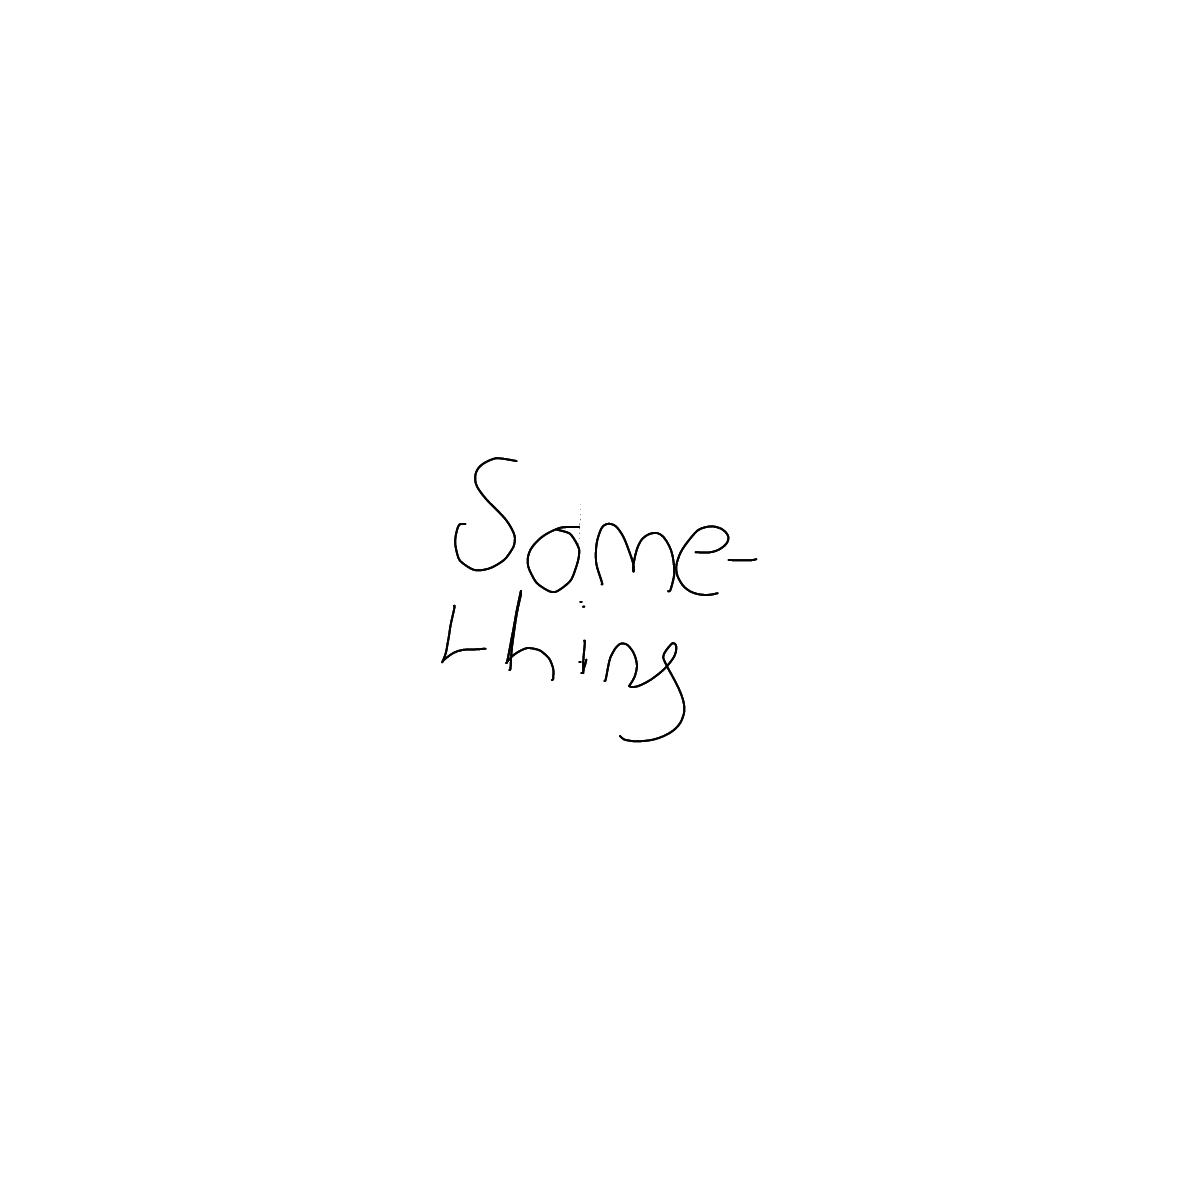 BAAAM drawing#1725 lat:53.0010070800781250lng: -1.1592309474945068